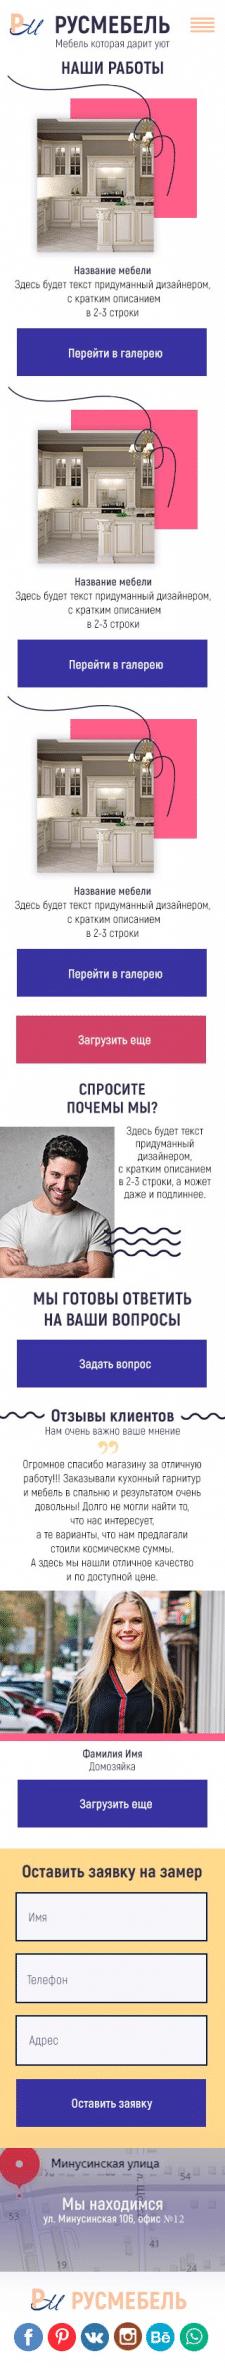 Lending page - РусМебель (адаптация для телефона)